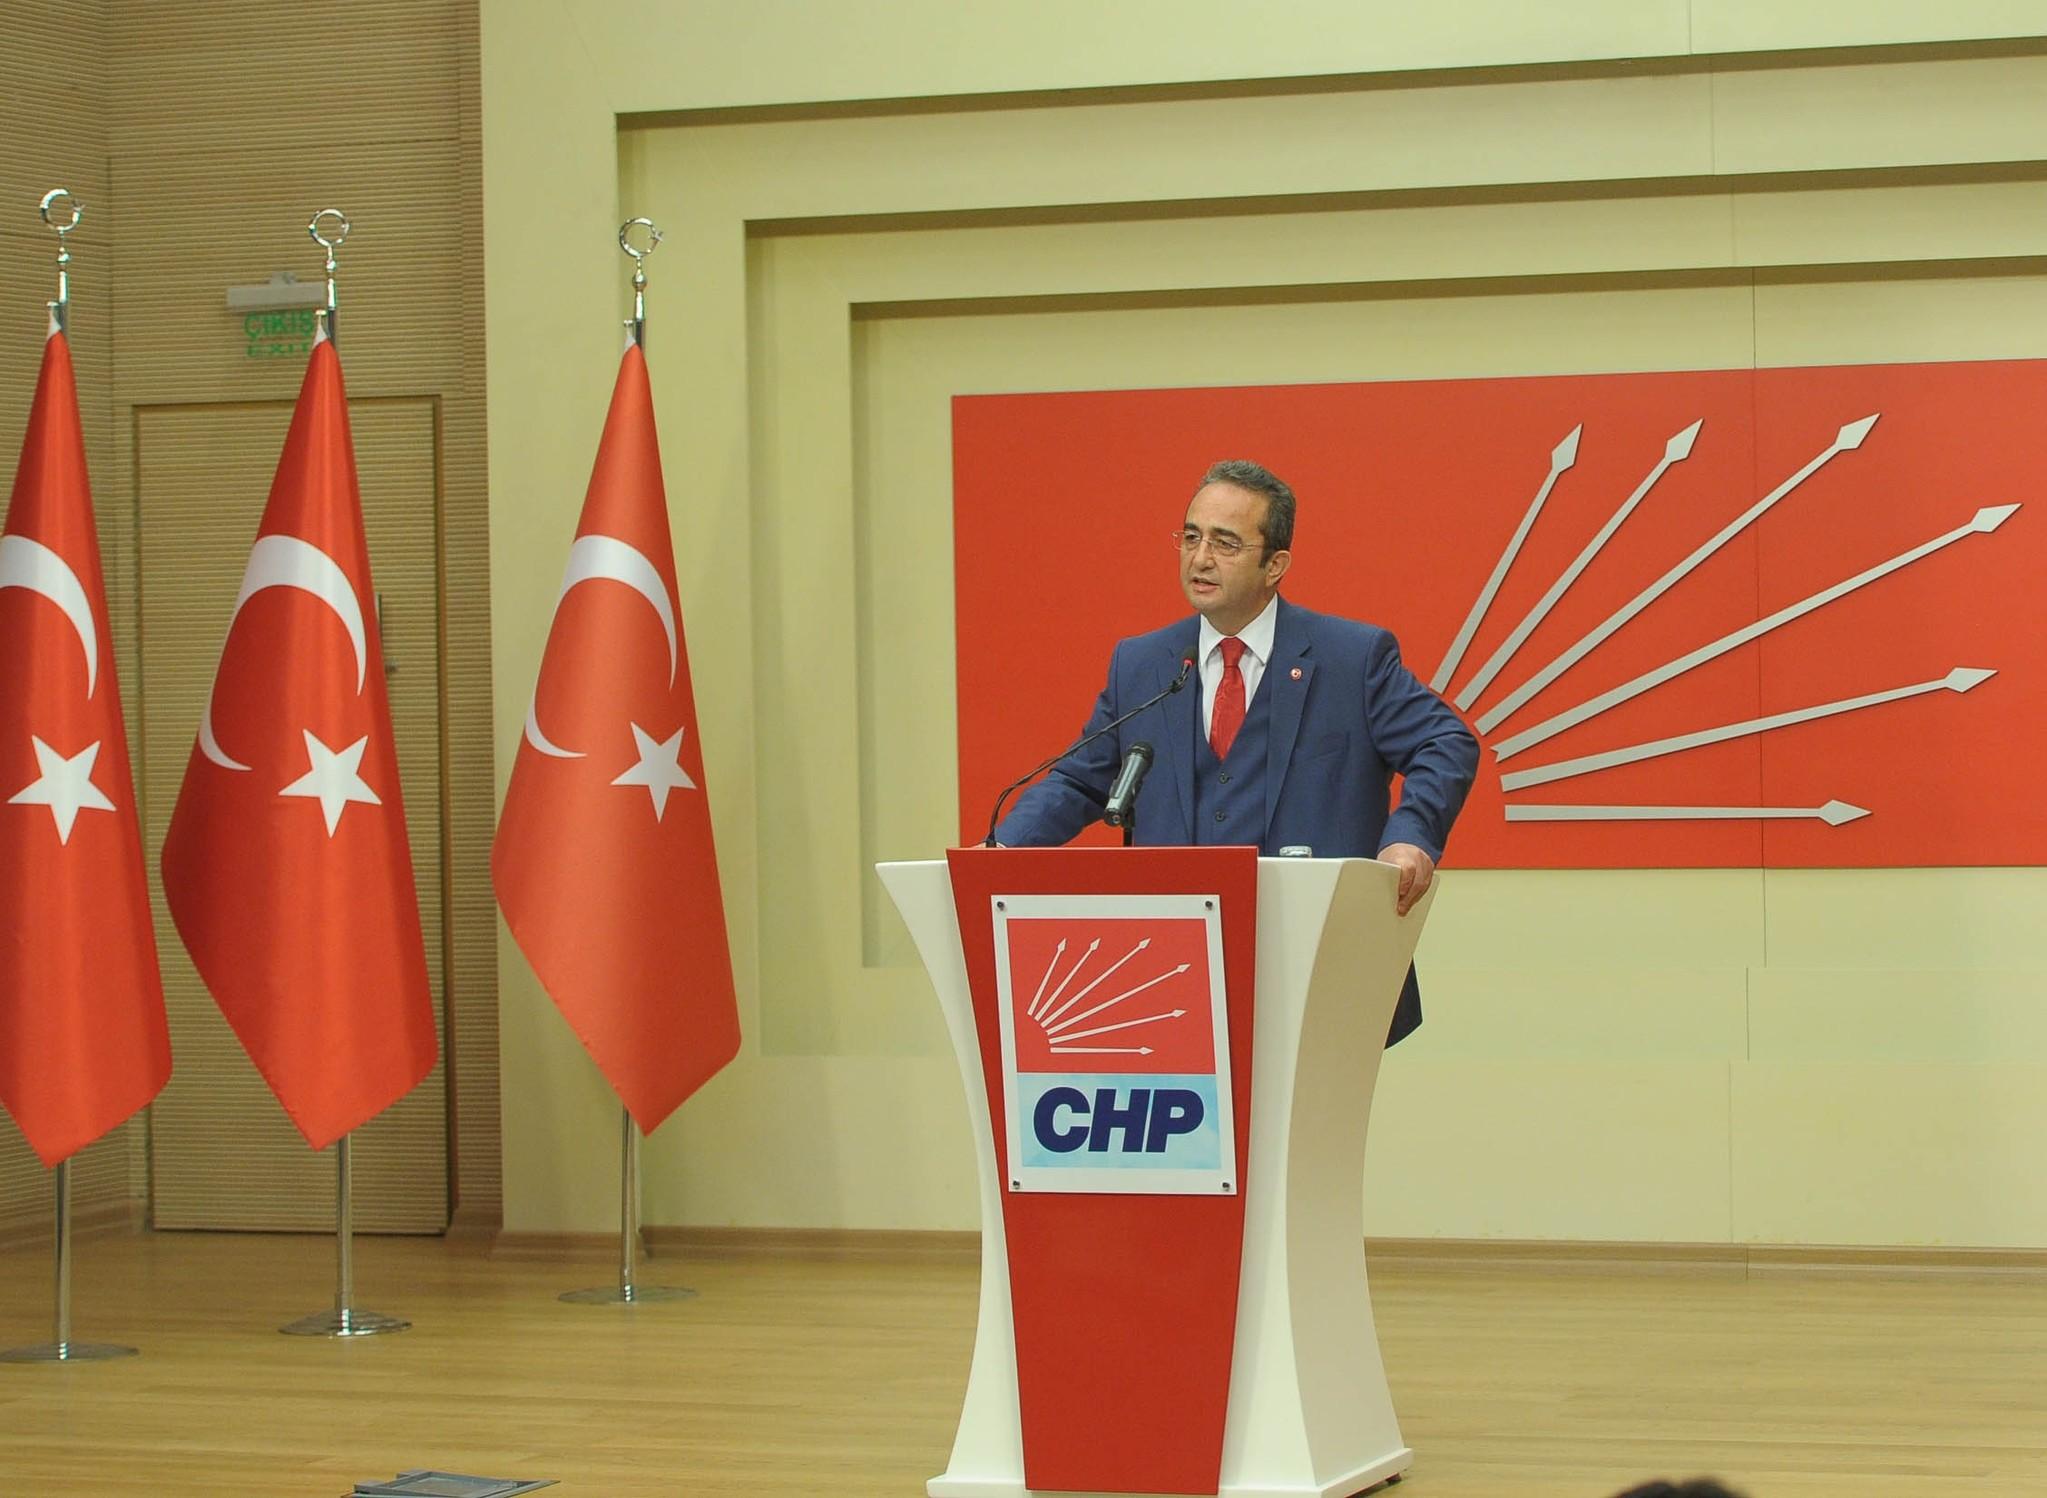 CHP spokesperson Bu00fclent Tezcan speaks to reporters in Ankara, Turkey on May 20, 2017. (DHA Photo)